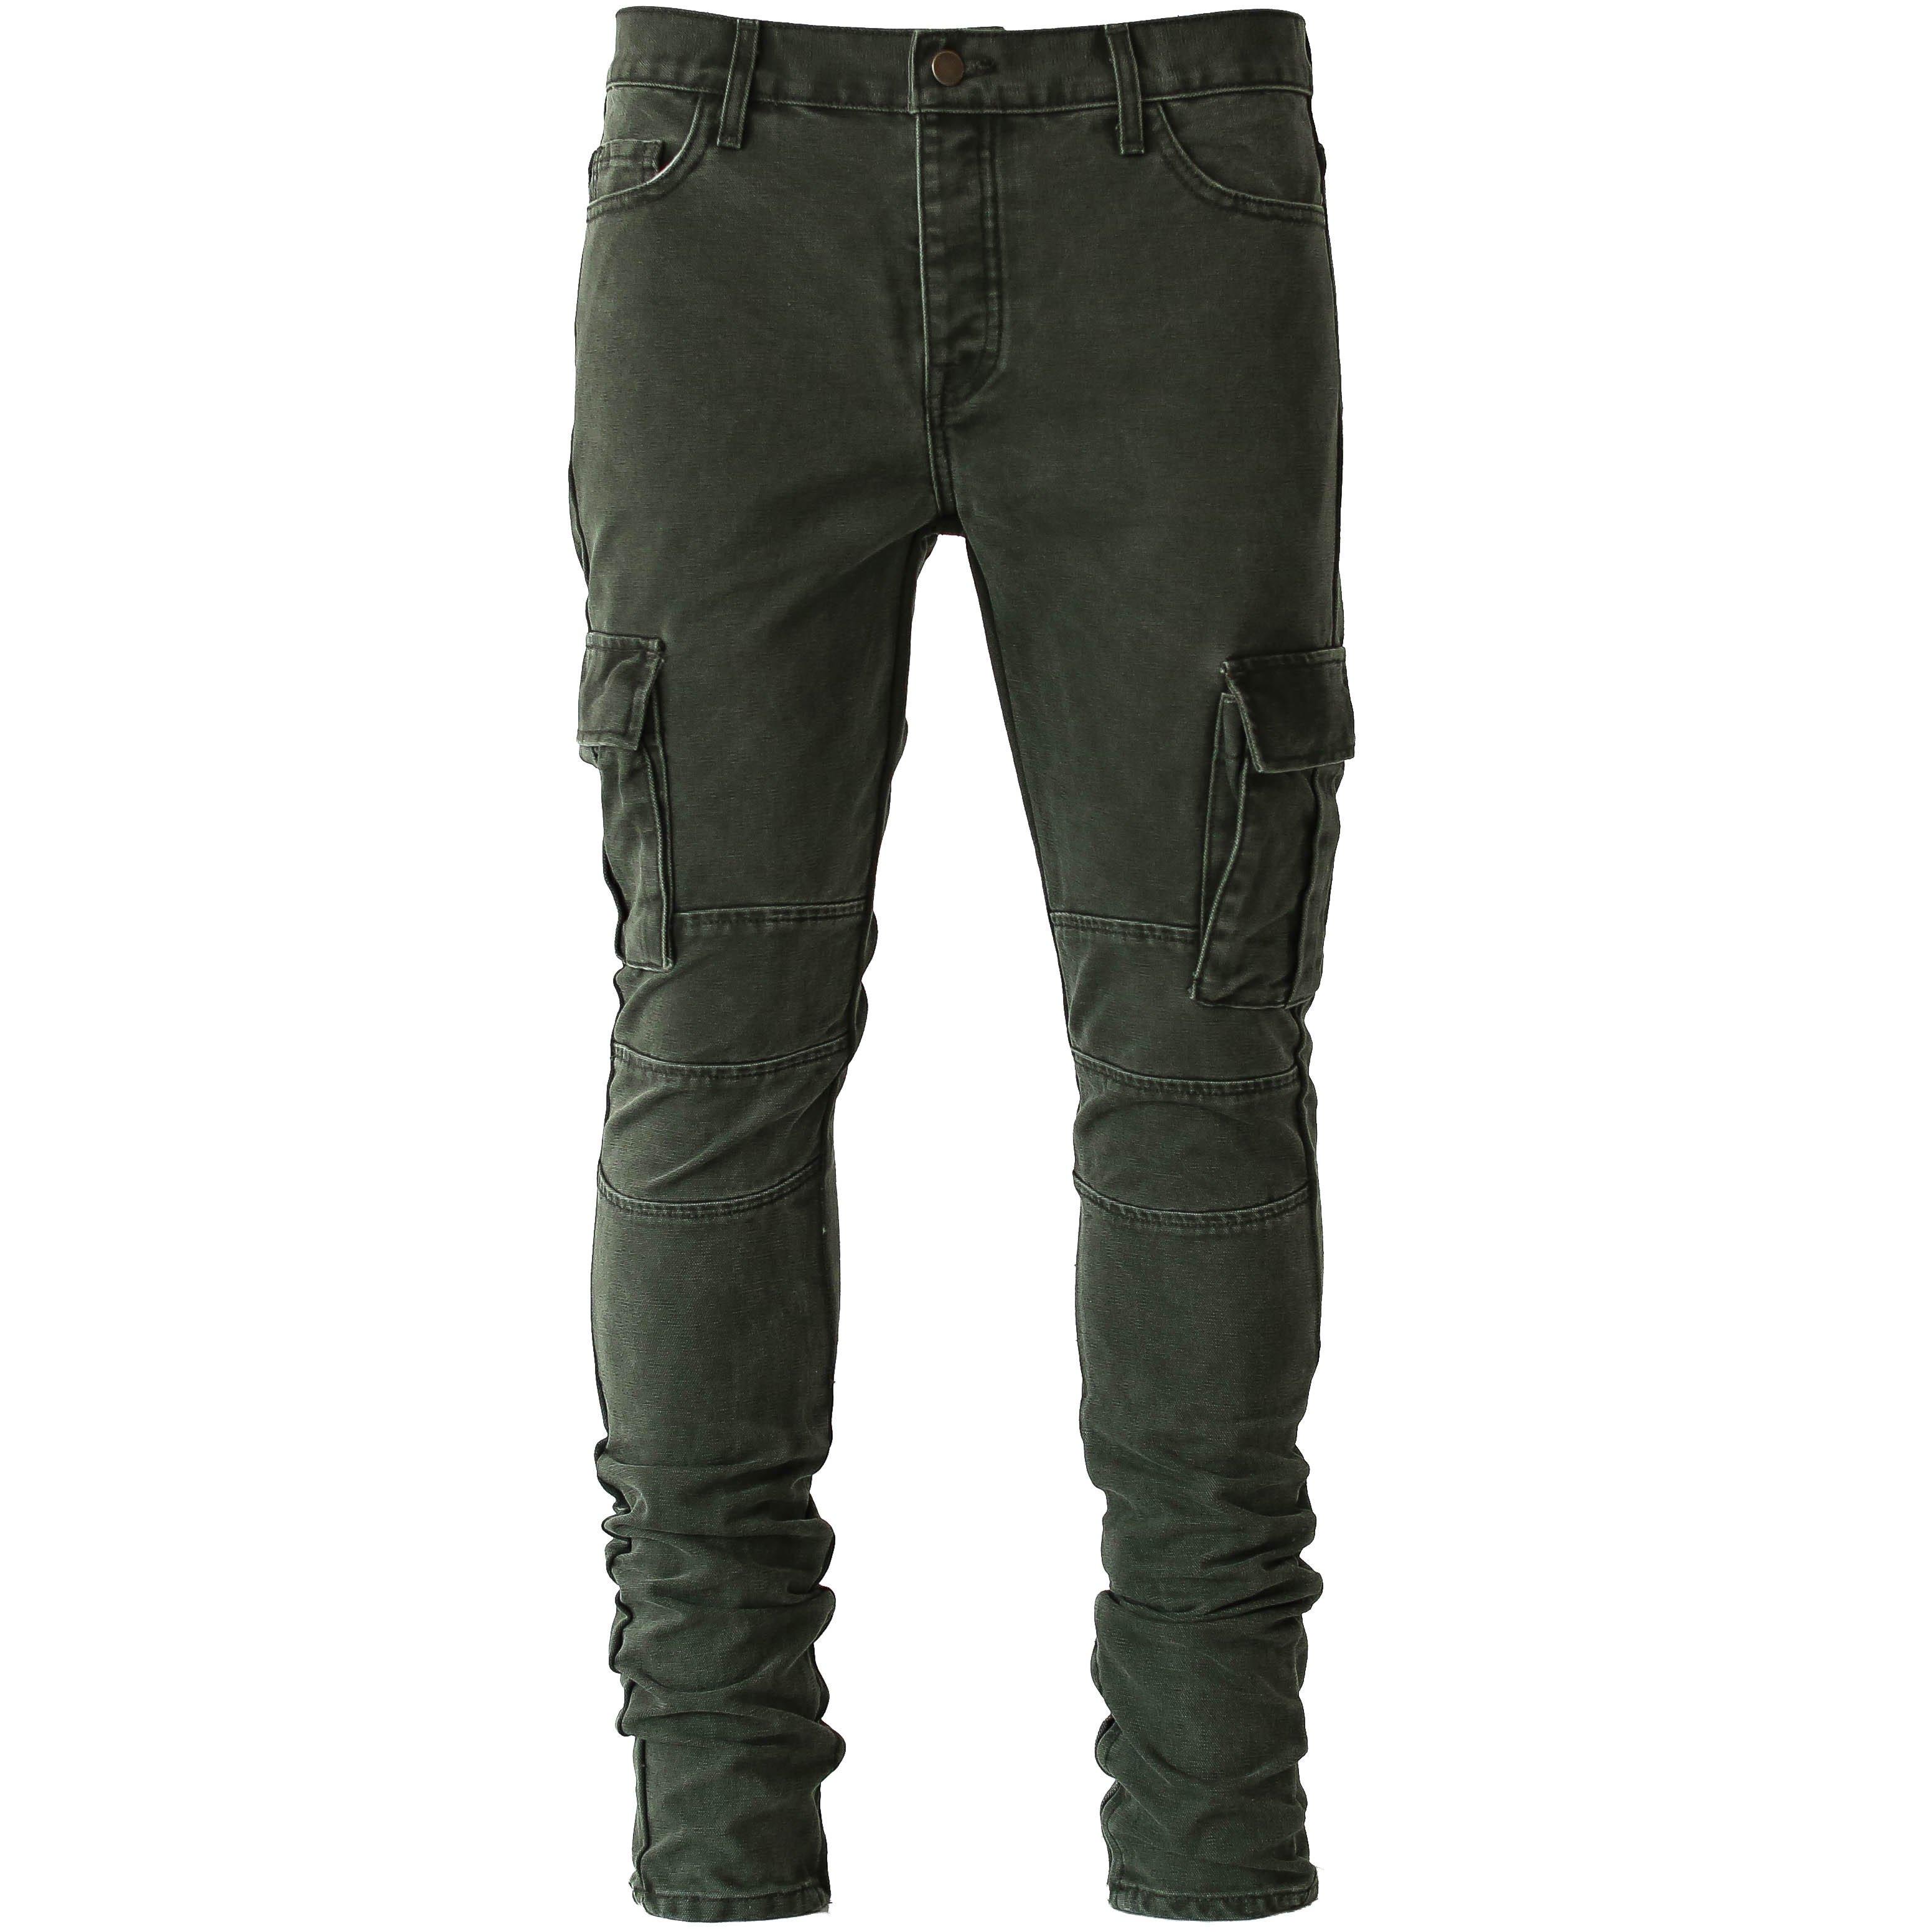 ... the olive cargo pants ... zocndpy